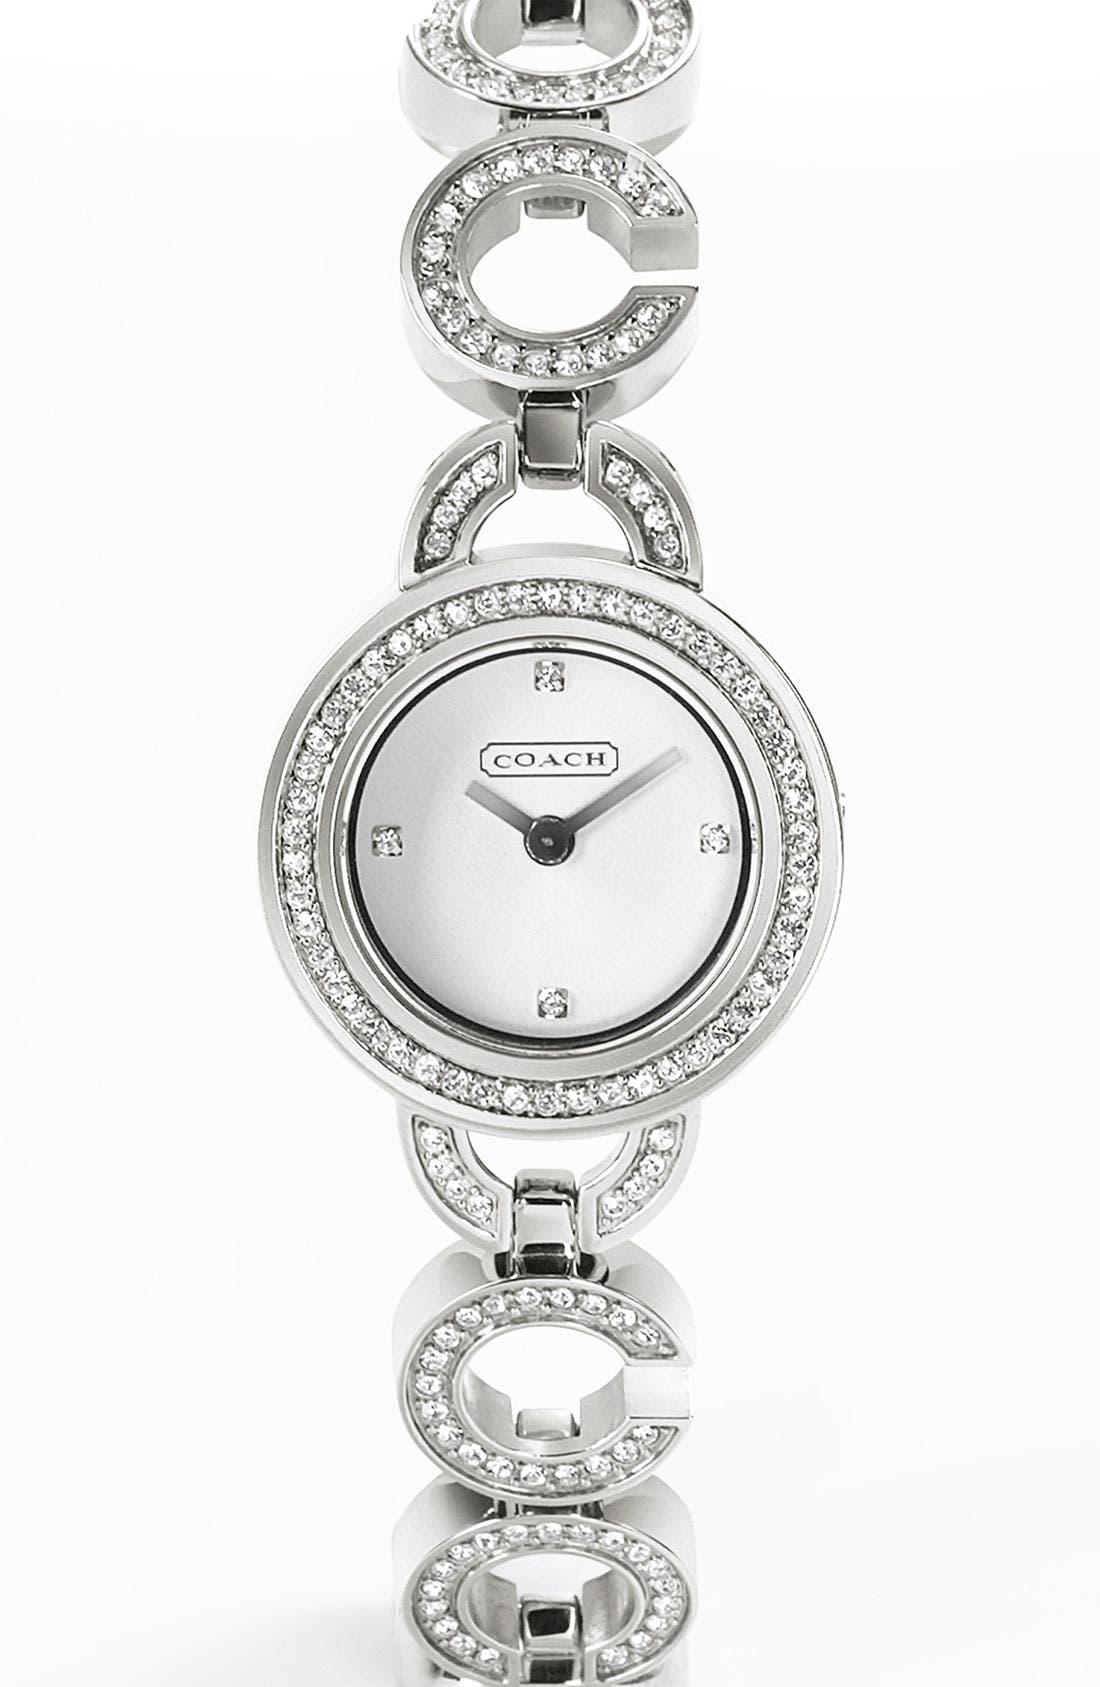 Main Image - COACH 'Kristy' Bracelet Watch